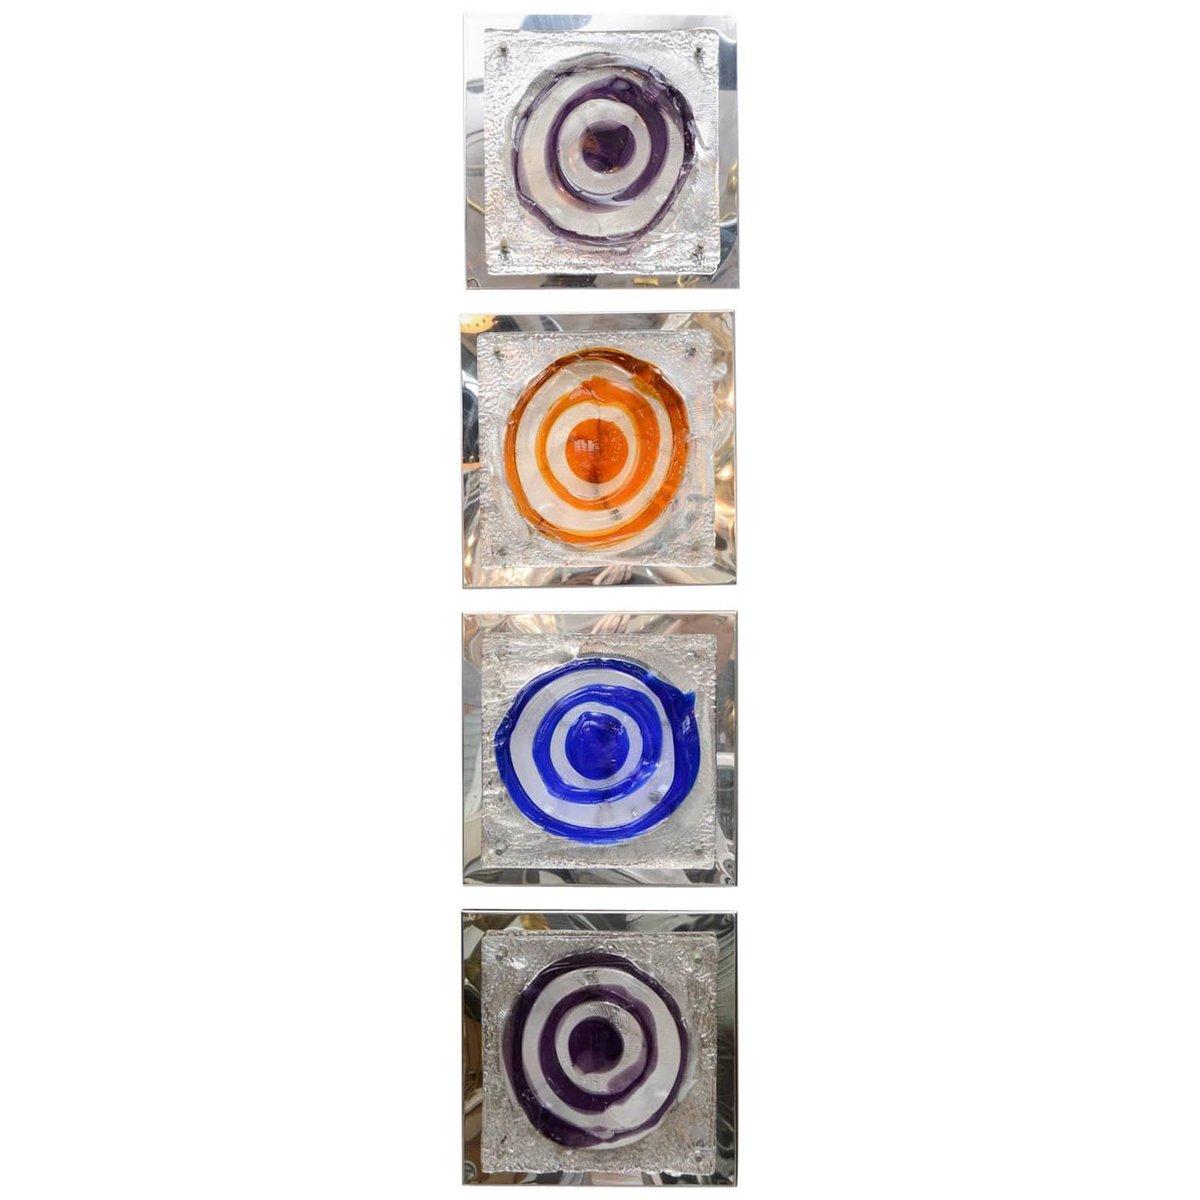 Lila quadratische Wandleuchte, 1970er